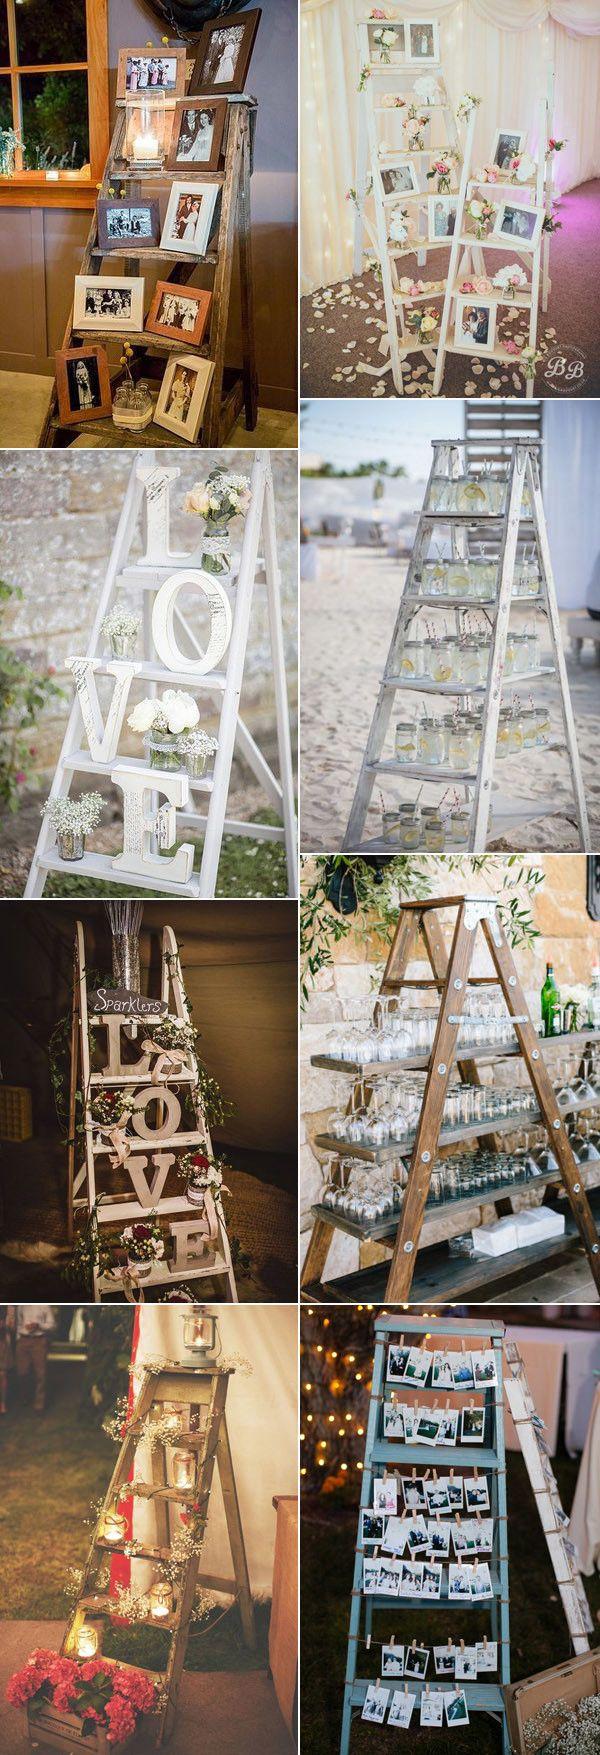 Unique church wedding decoration ideas   Perfect Wedding Decoration Ideas with Vintage Ladders  Display